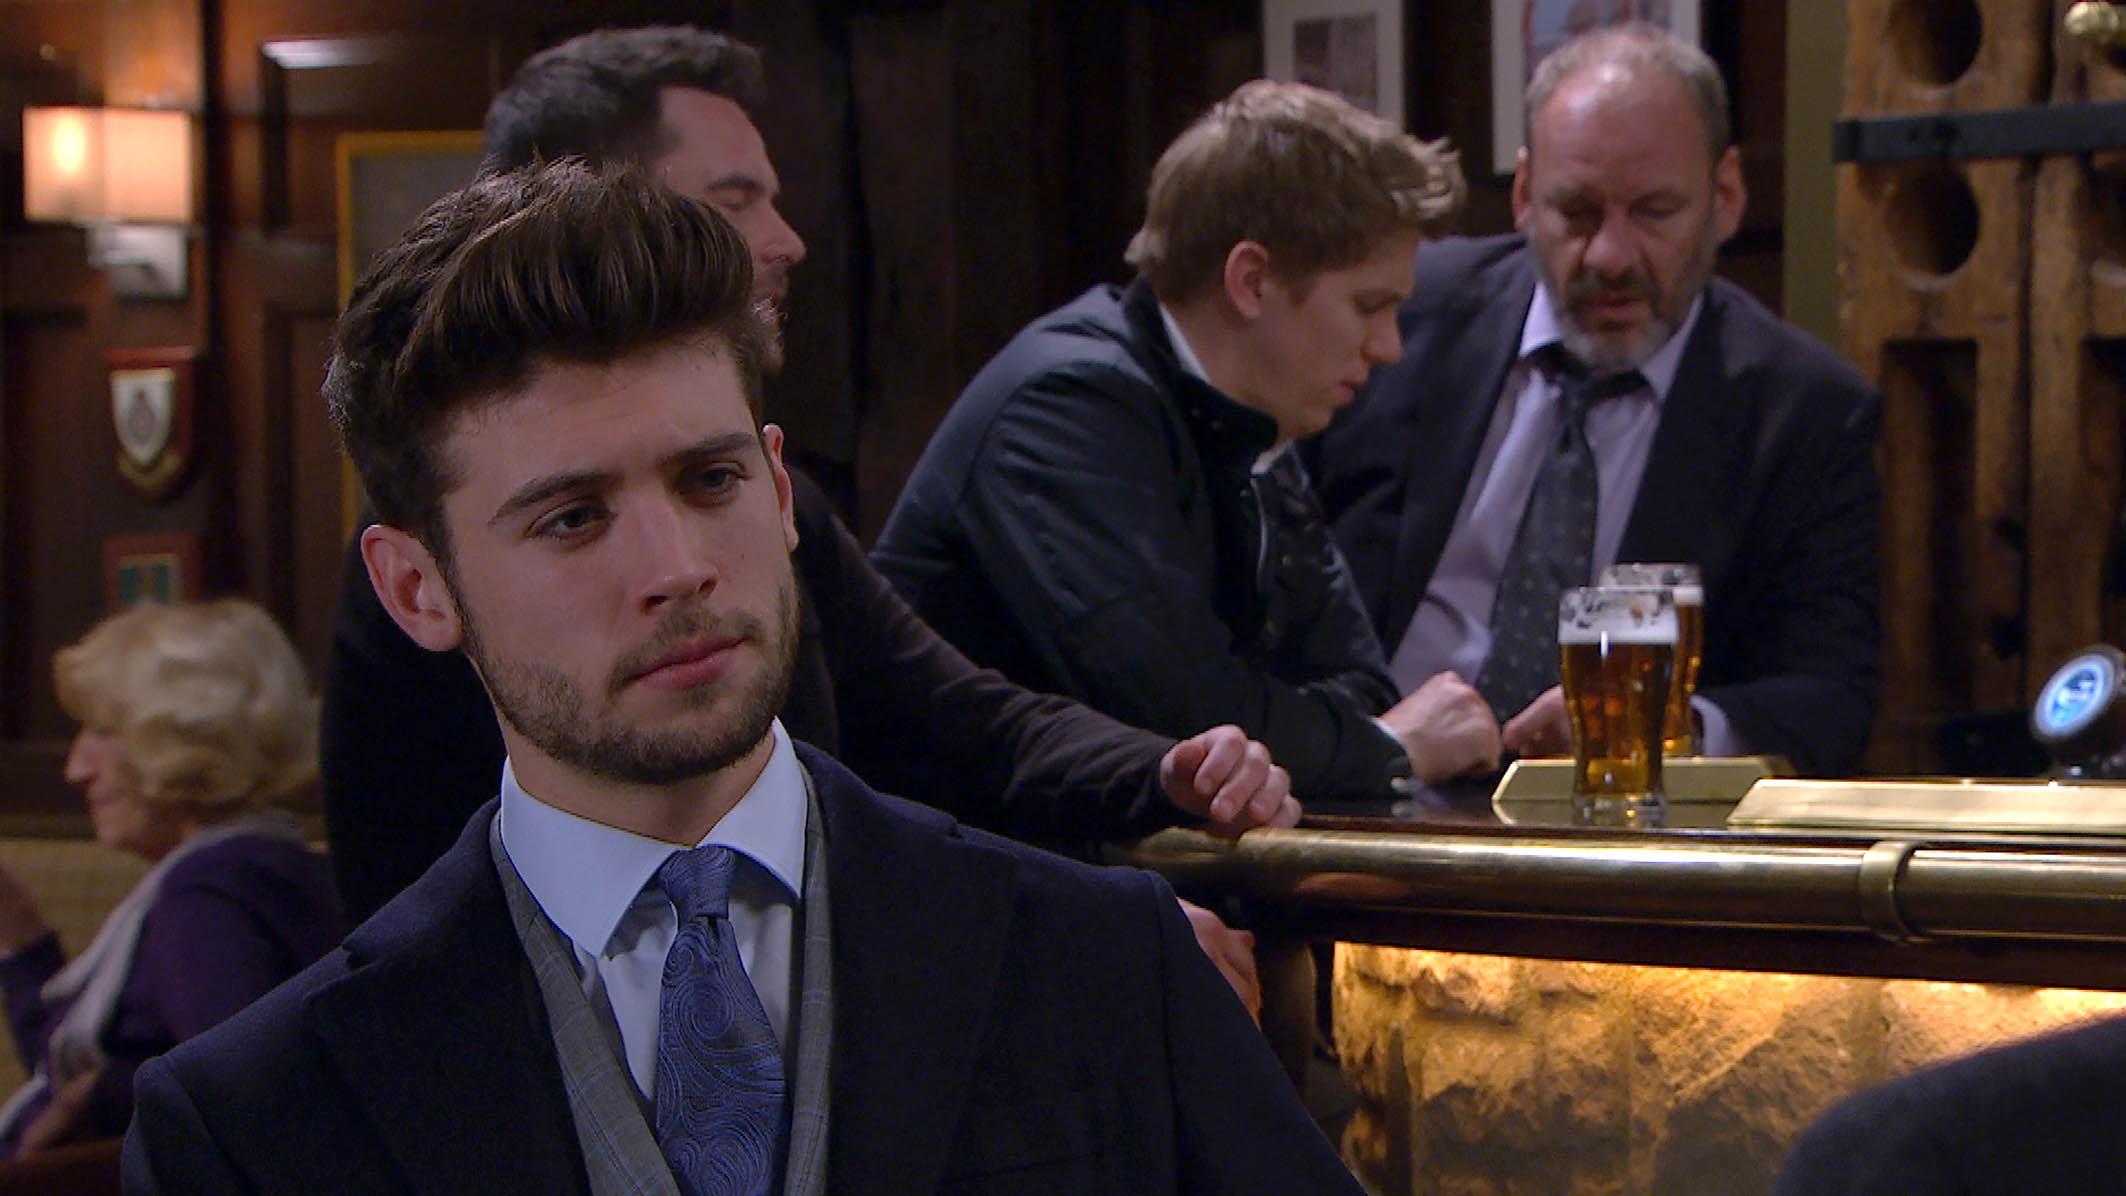 Joe plots against Robert and Aaron